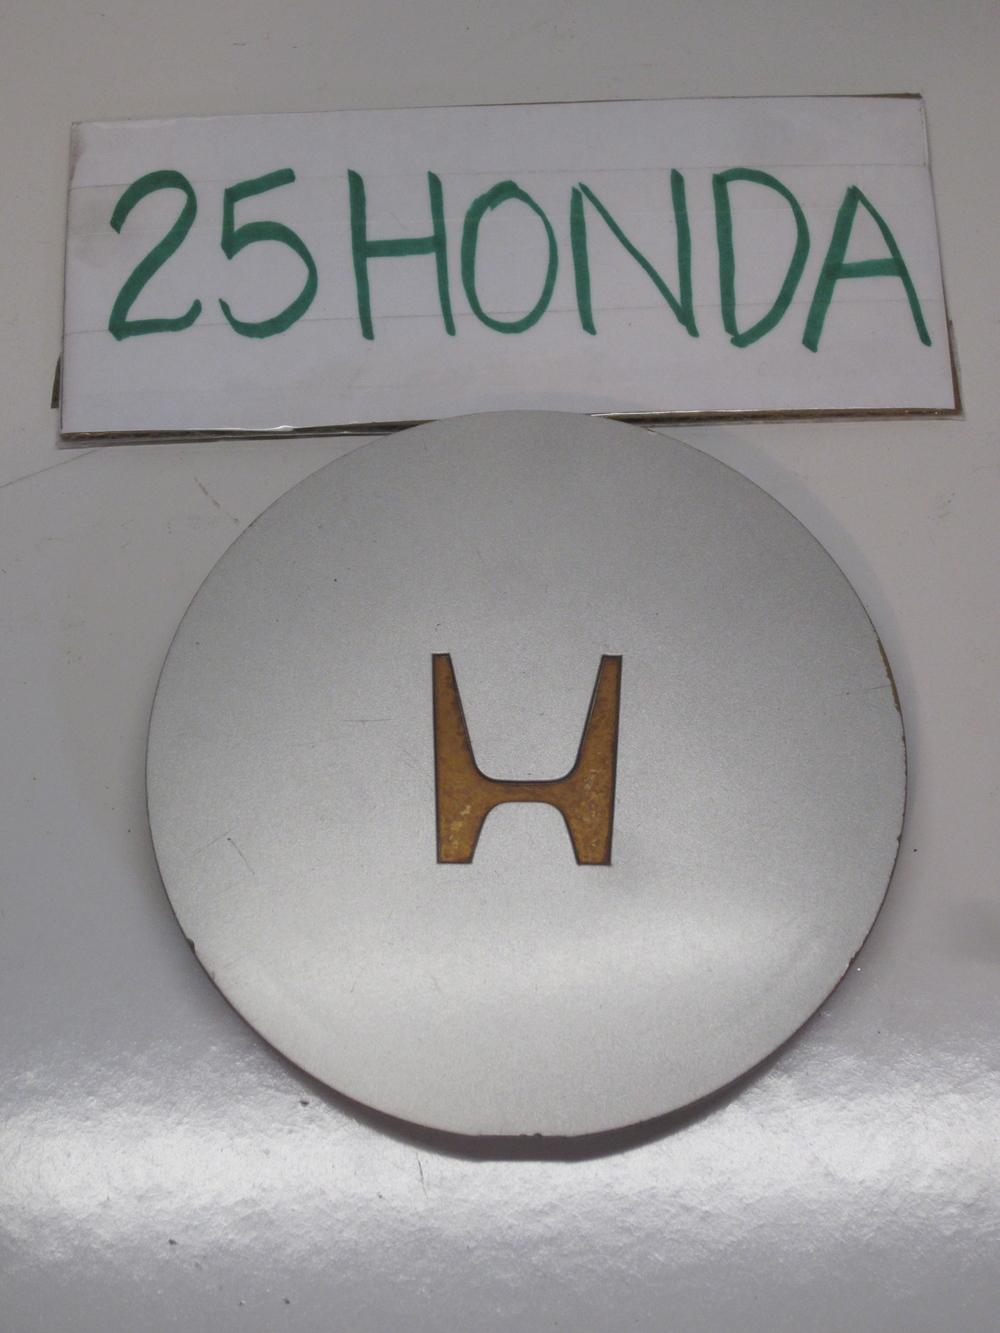 1988 1989 Honda Crx Si Rim Wheel Center Cap